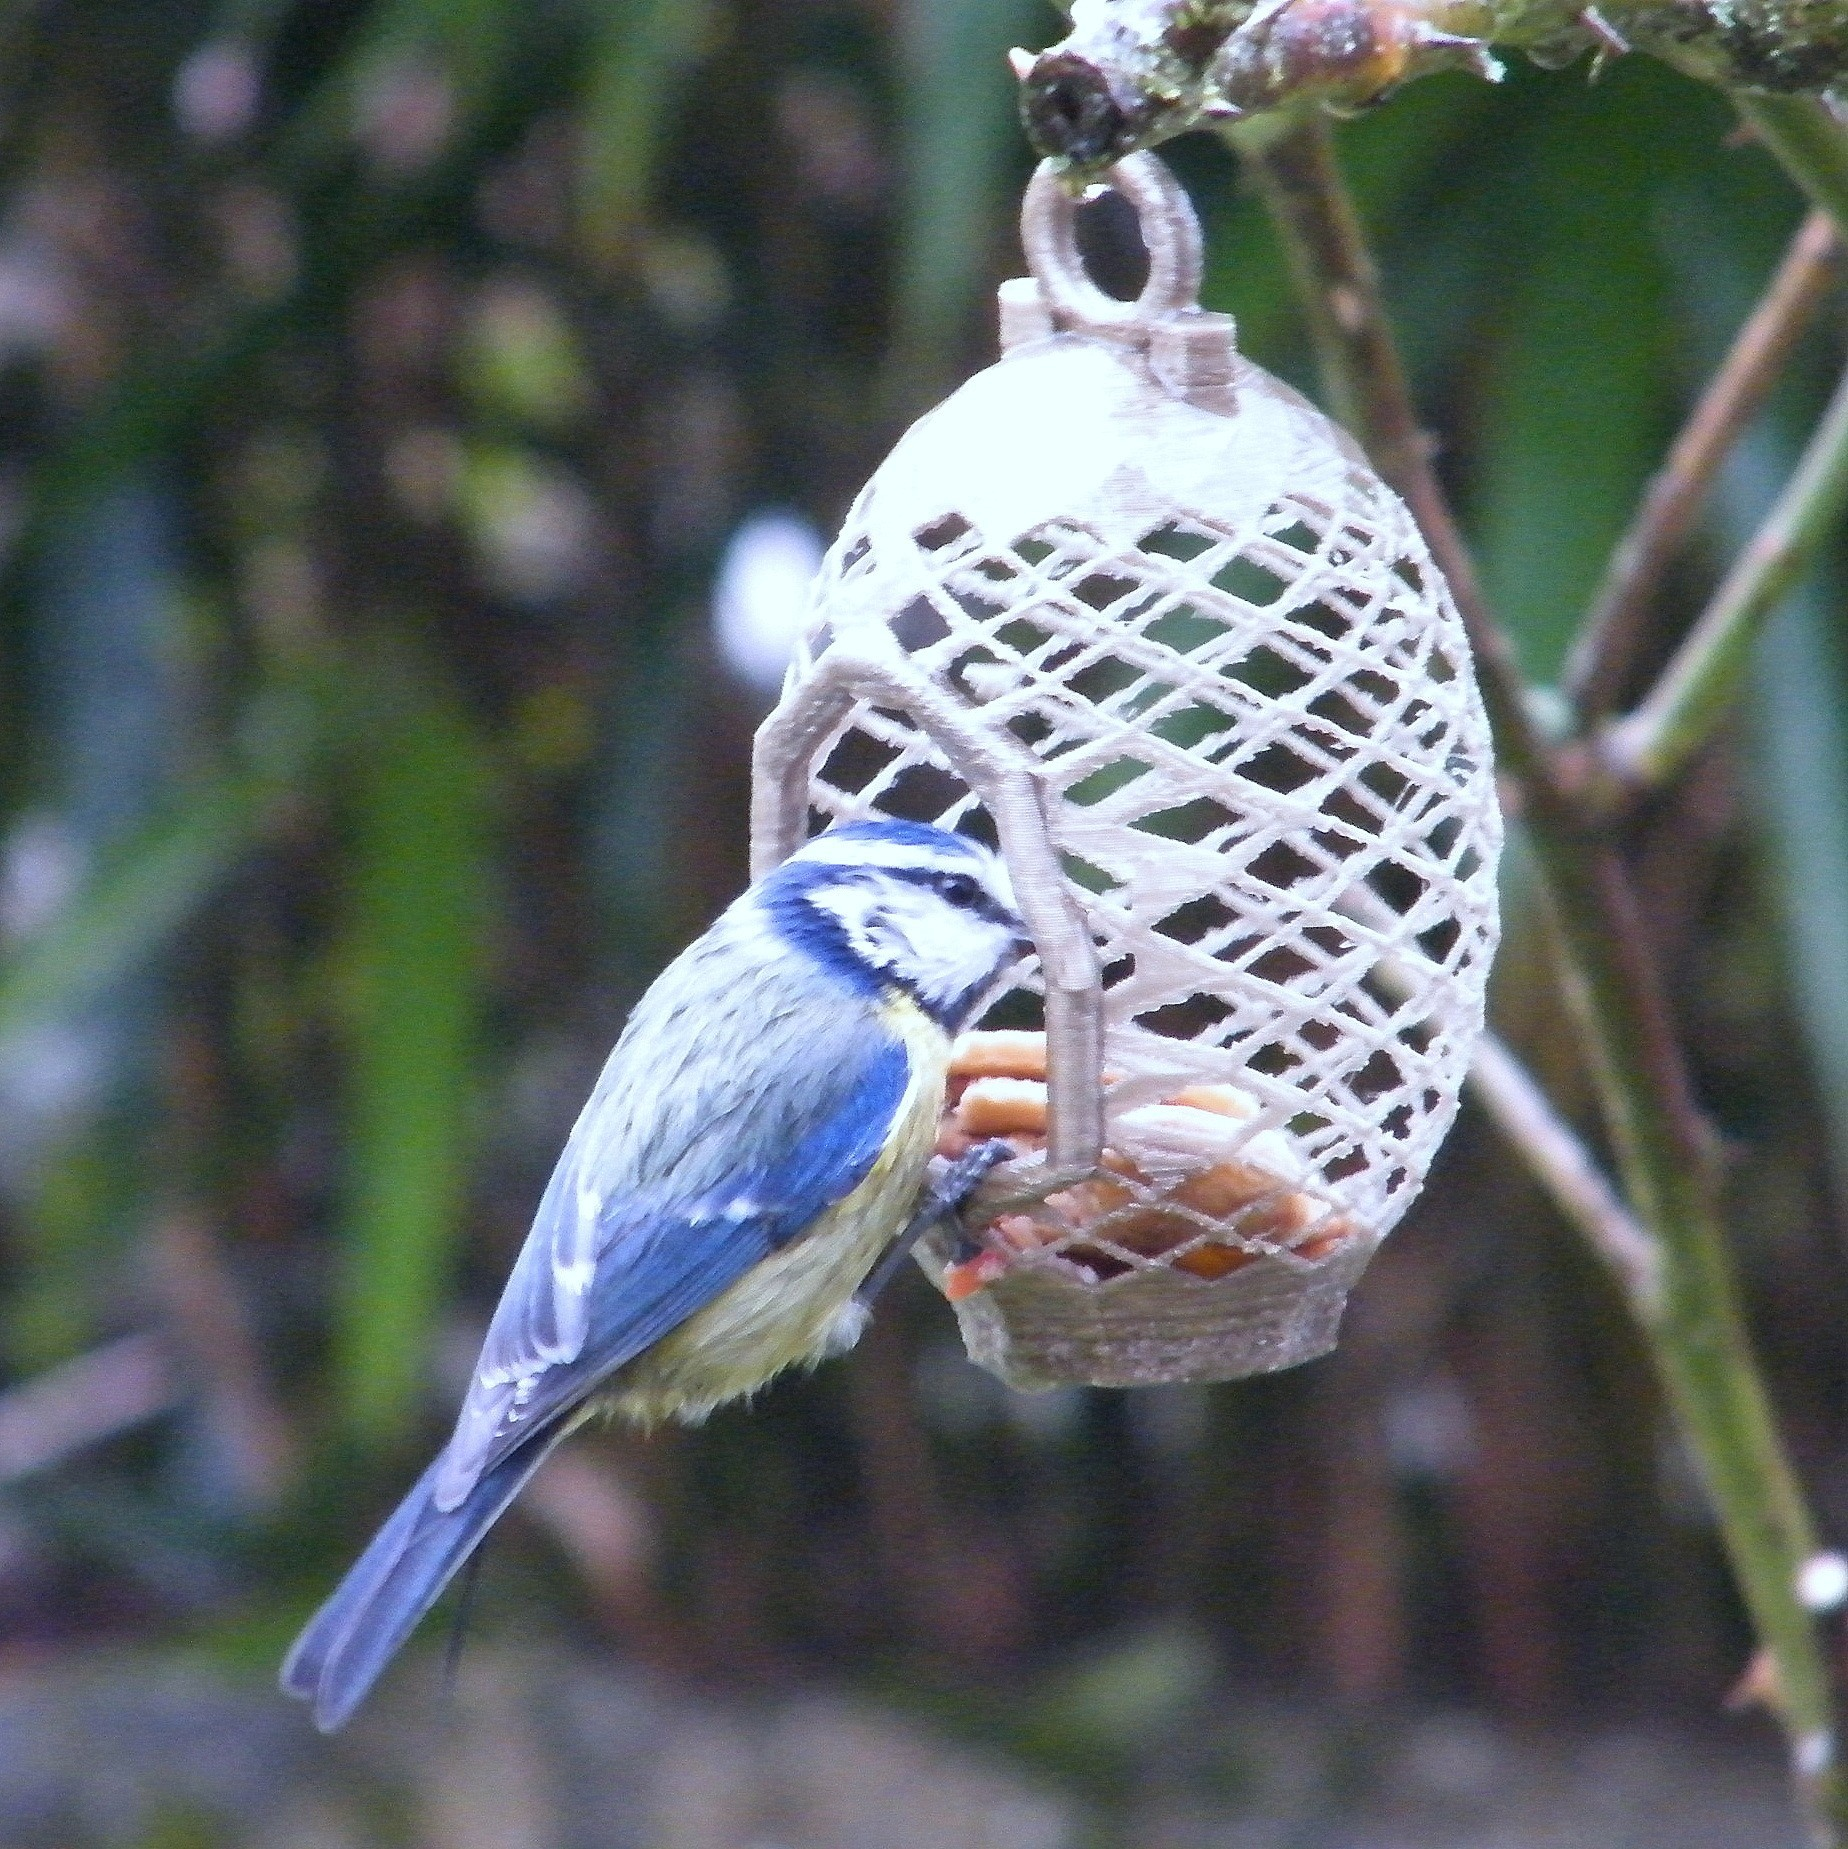 nichoir_ext_4.jpg Download STL file Wild bird feeder • 3D print model, 3d-fabric-jean-pierre